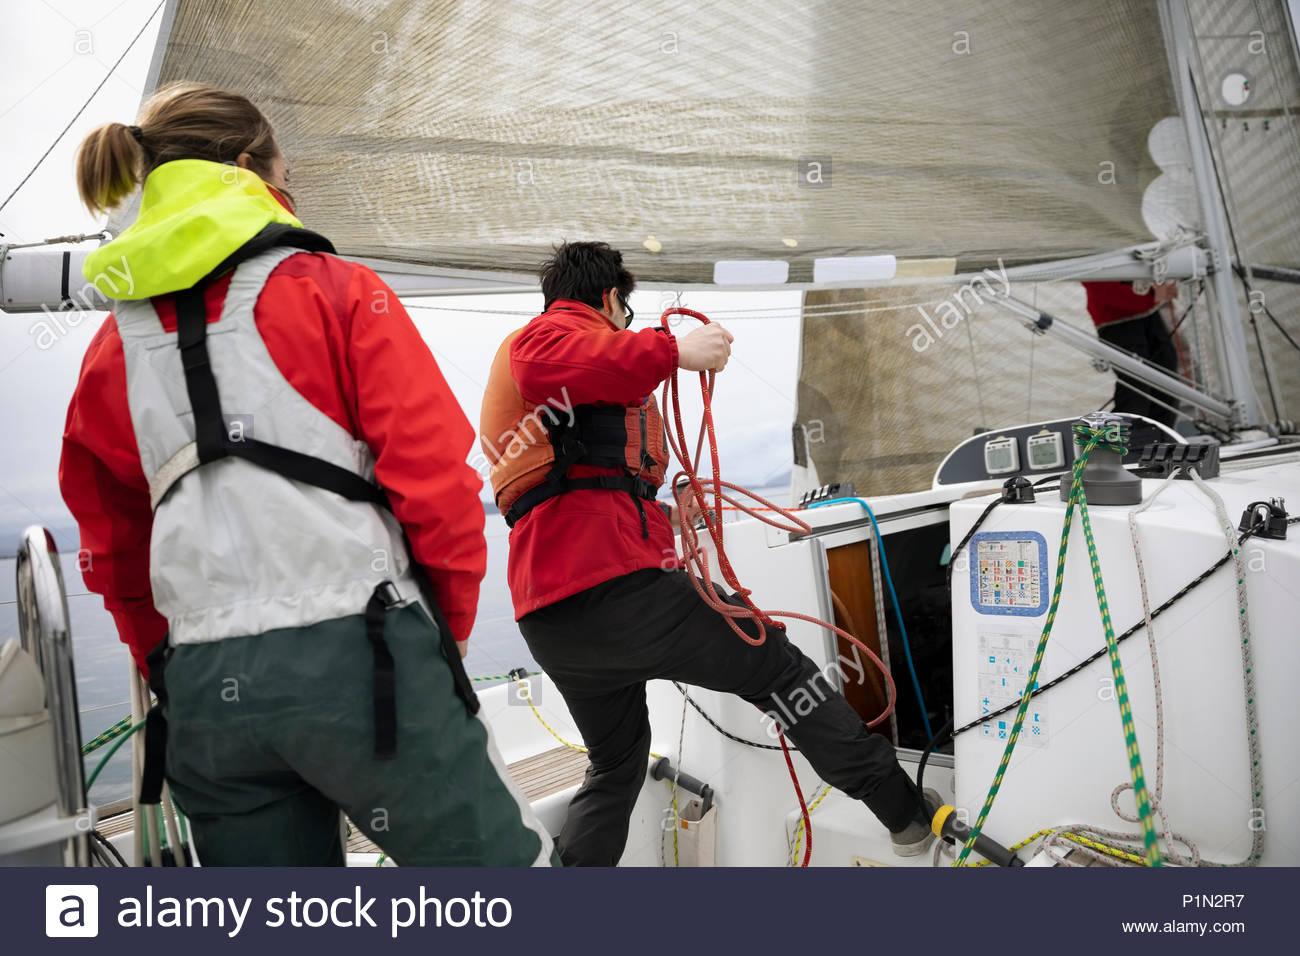 Sailing team adjusting rigging rope on sailboat - Stock Image